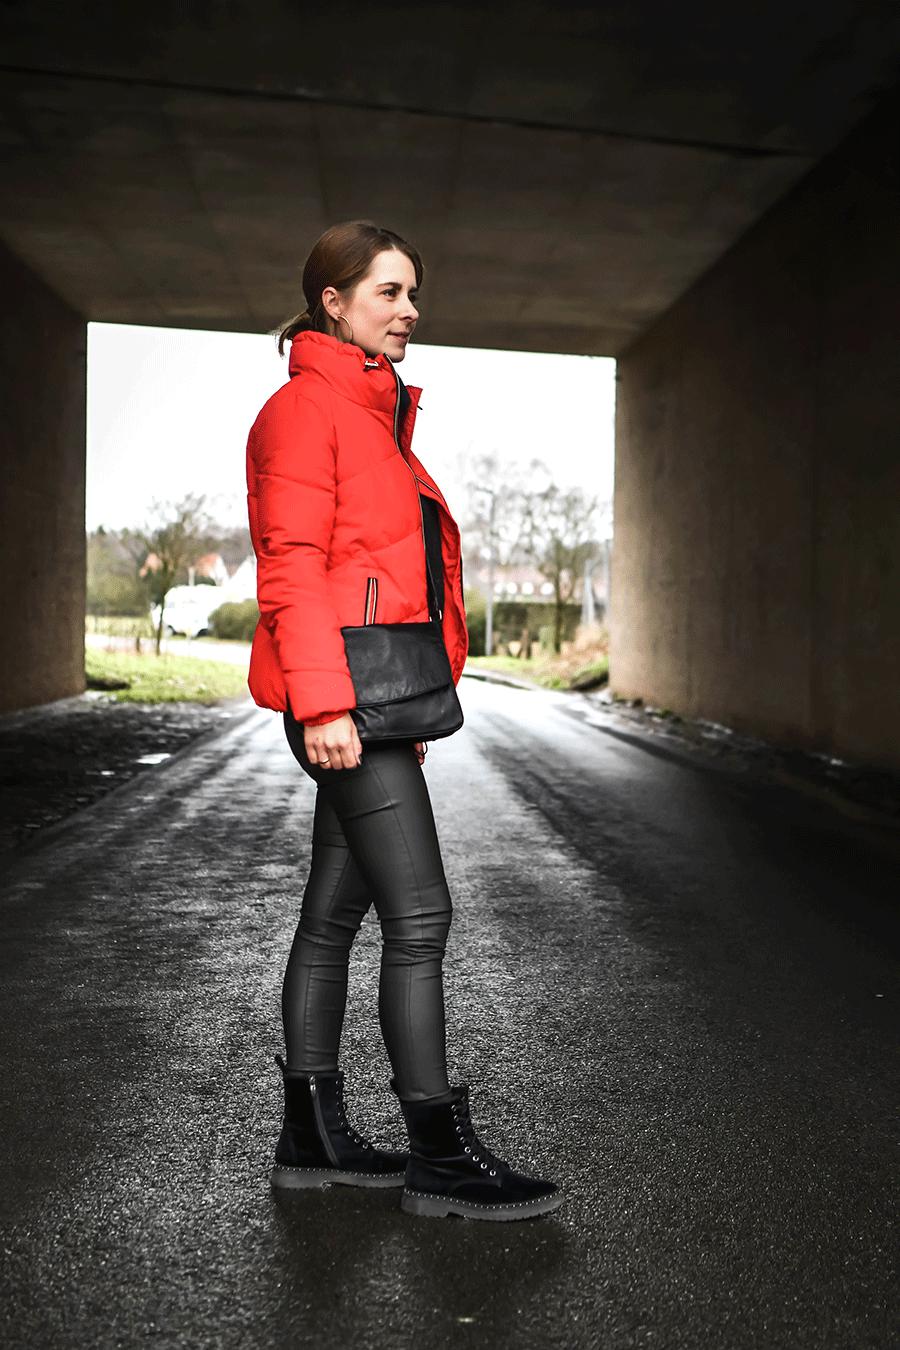 Winter - Outfit: Daunenjacke, Hose in Lederoptik und Boots